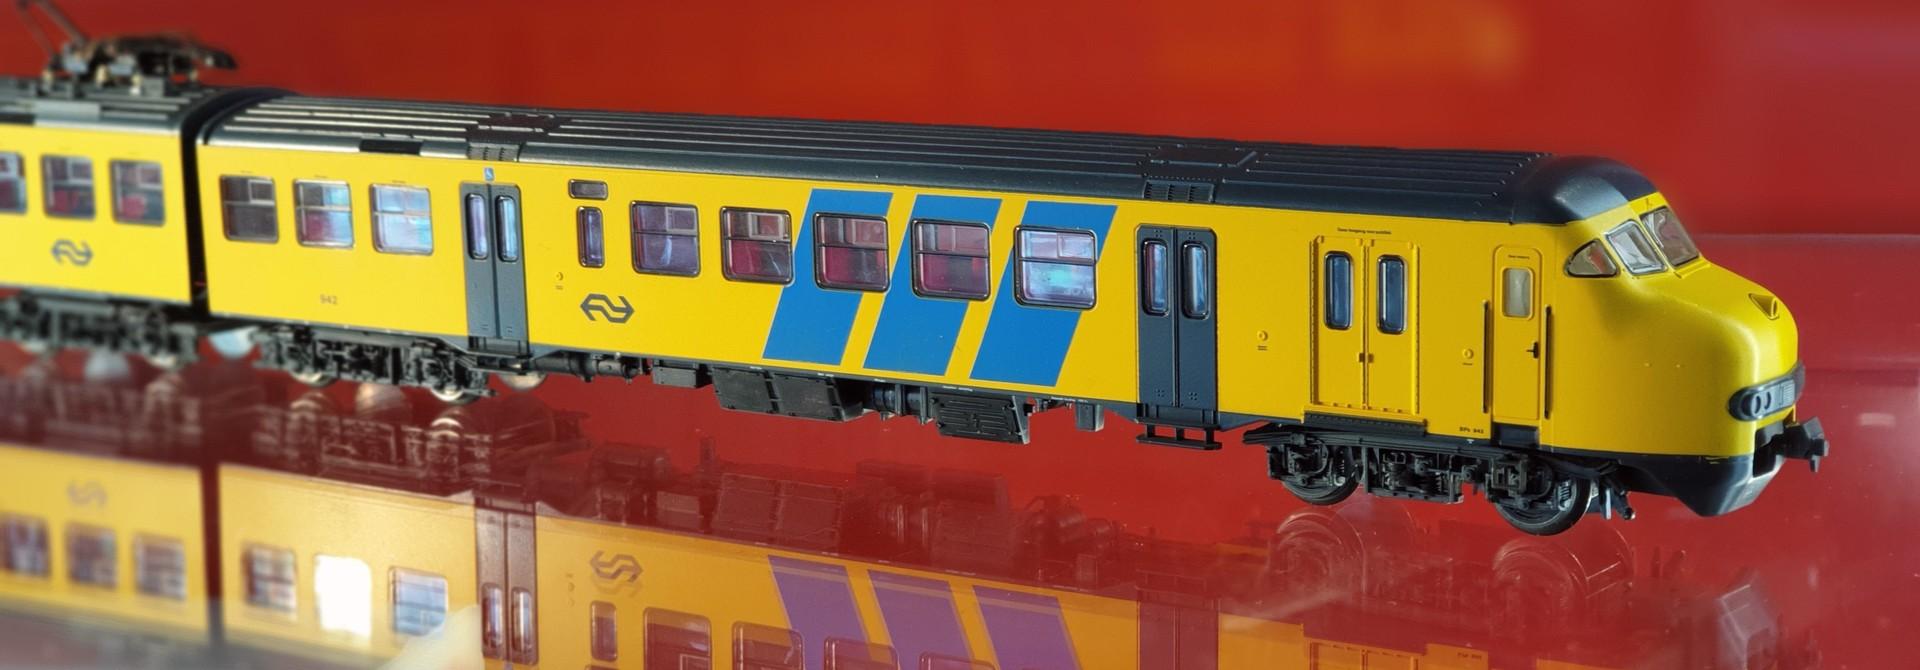 1472 treinstel Plan V van de NS AC digitaal